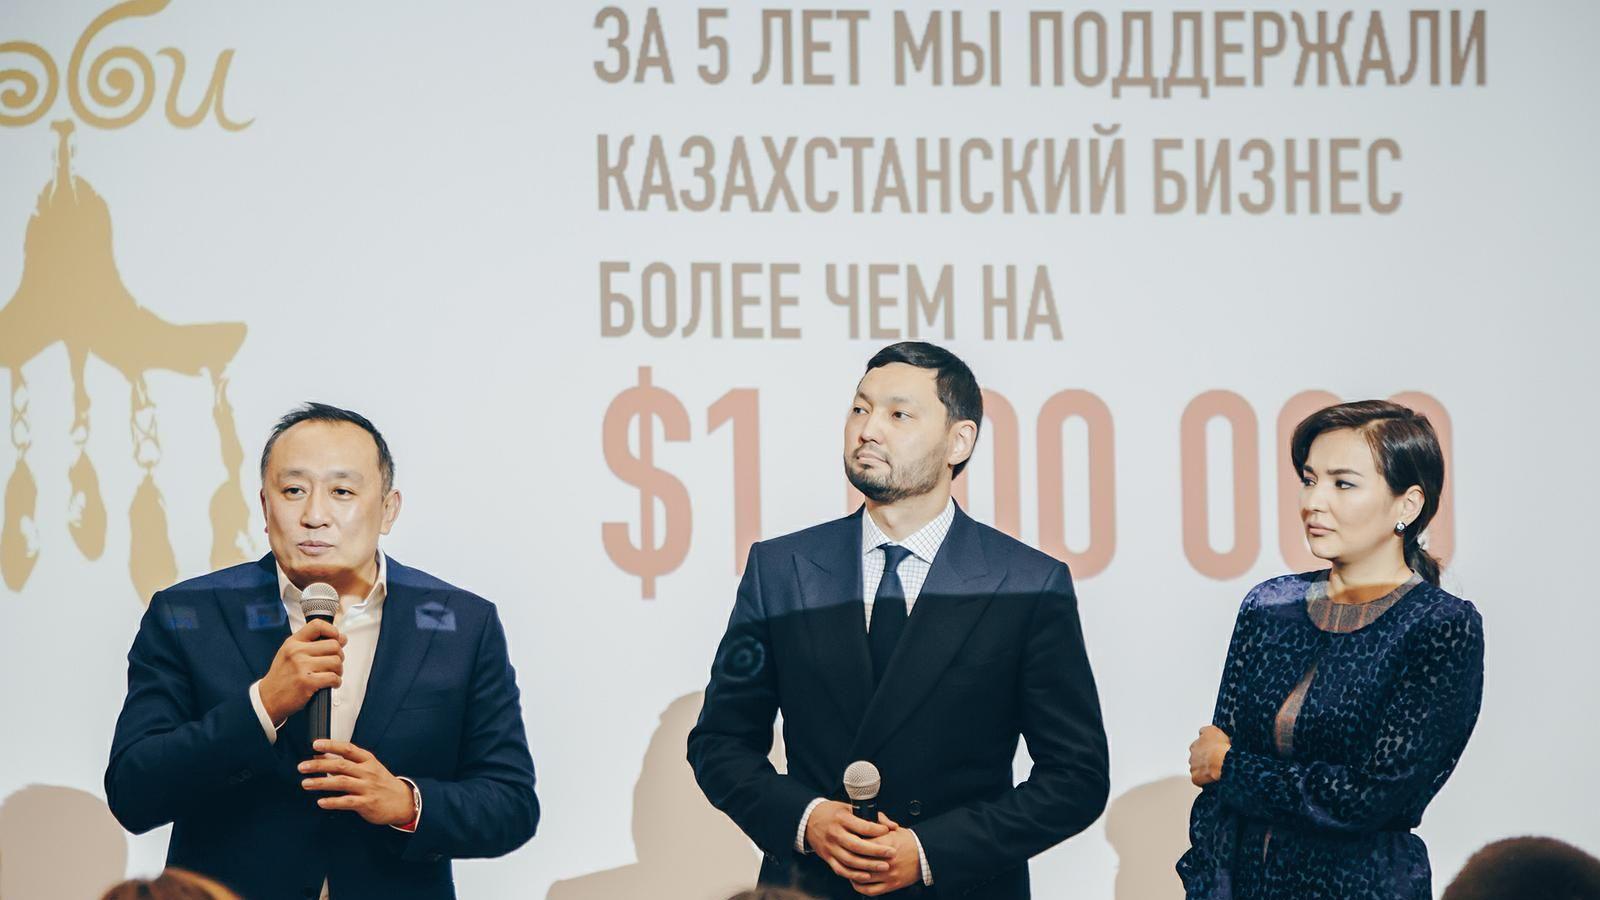 06.11.2019 В Казахстане начался прием заявок на конкурс